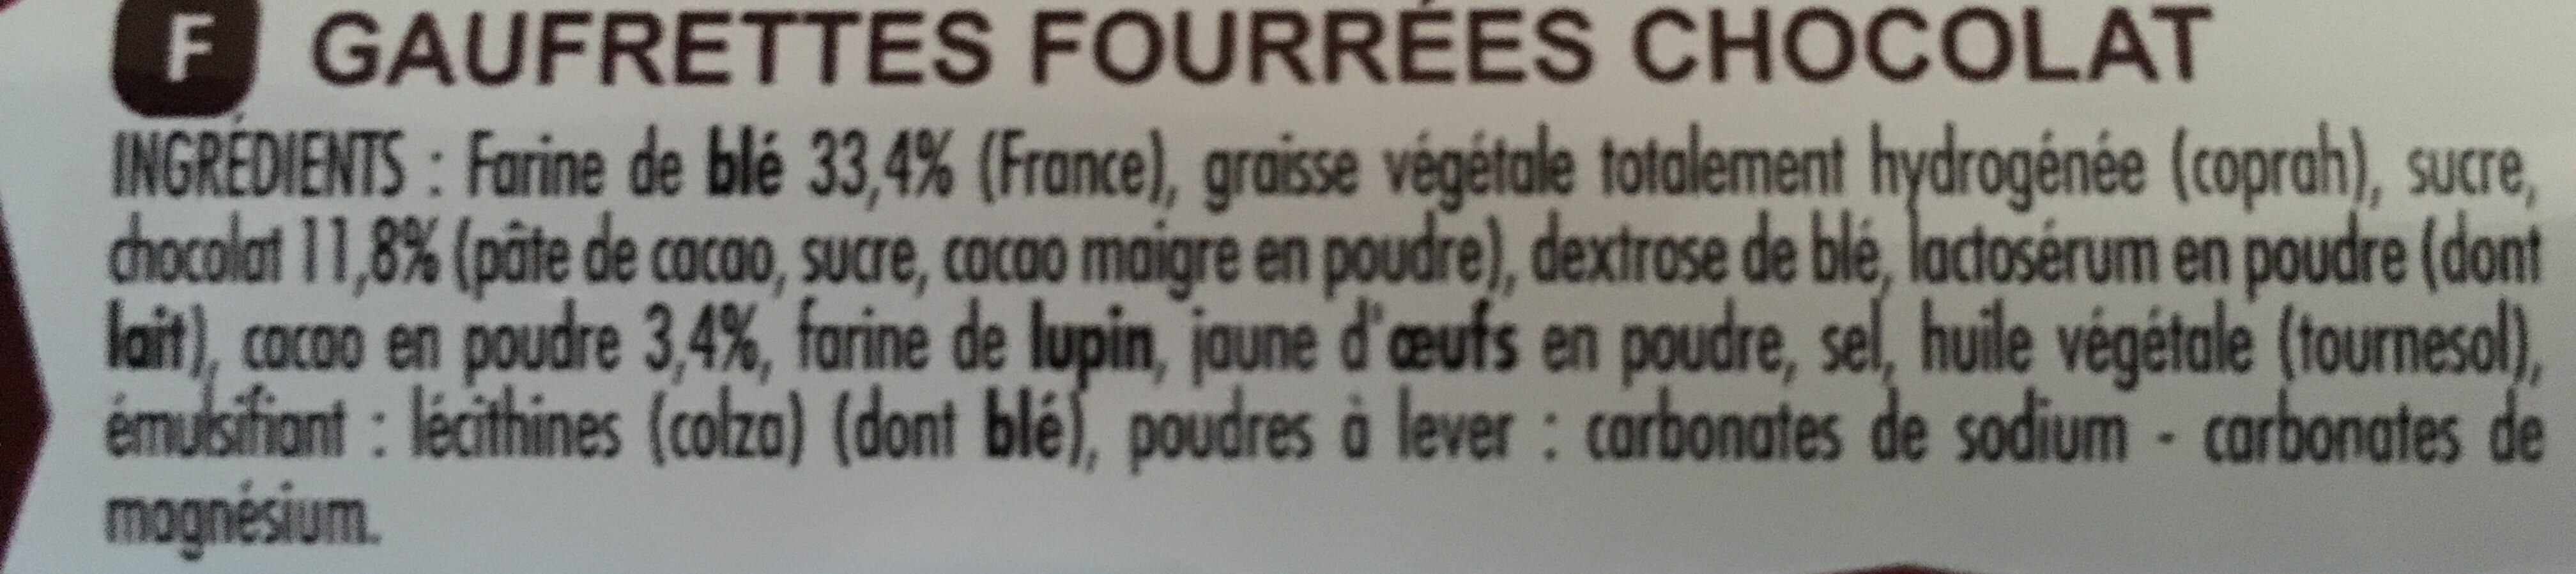 Gaufrettes croustilles chocolat - Ingrediënten - fr